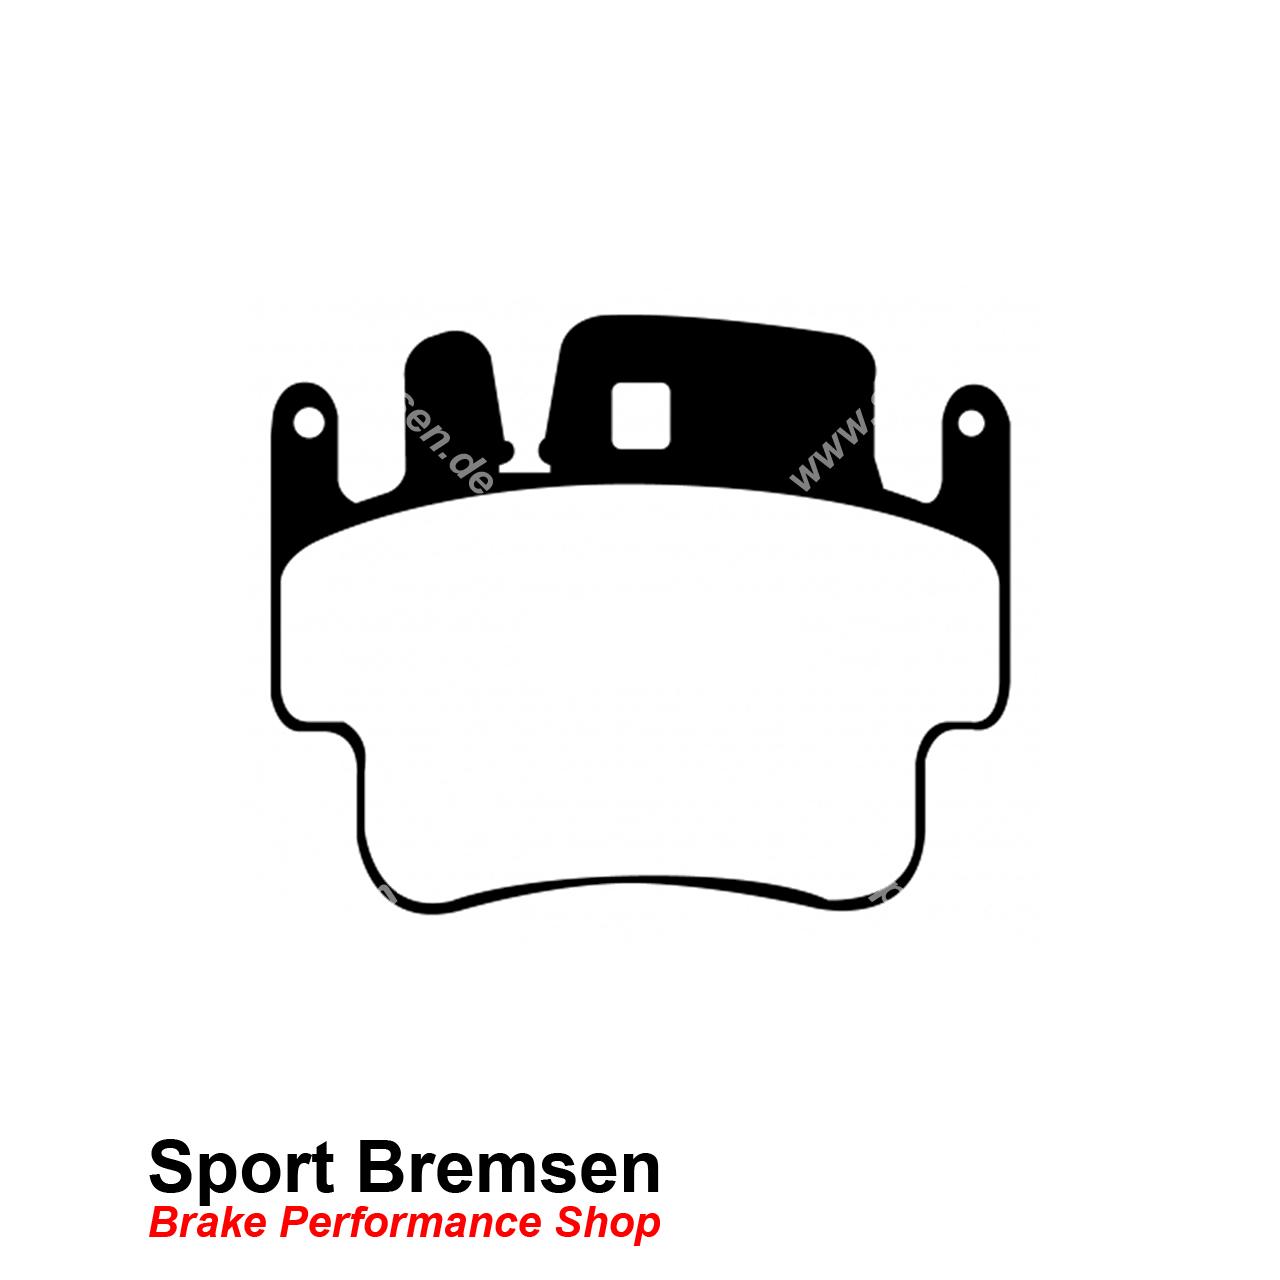 Ebc Racing Bluestuff Bremsbelage Fur Porsche 911